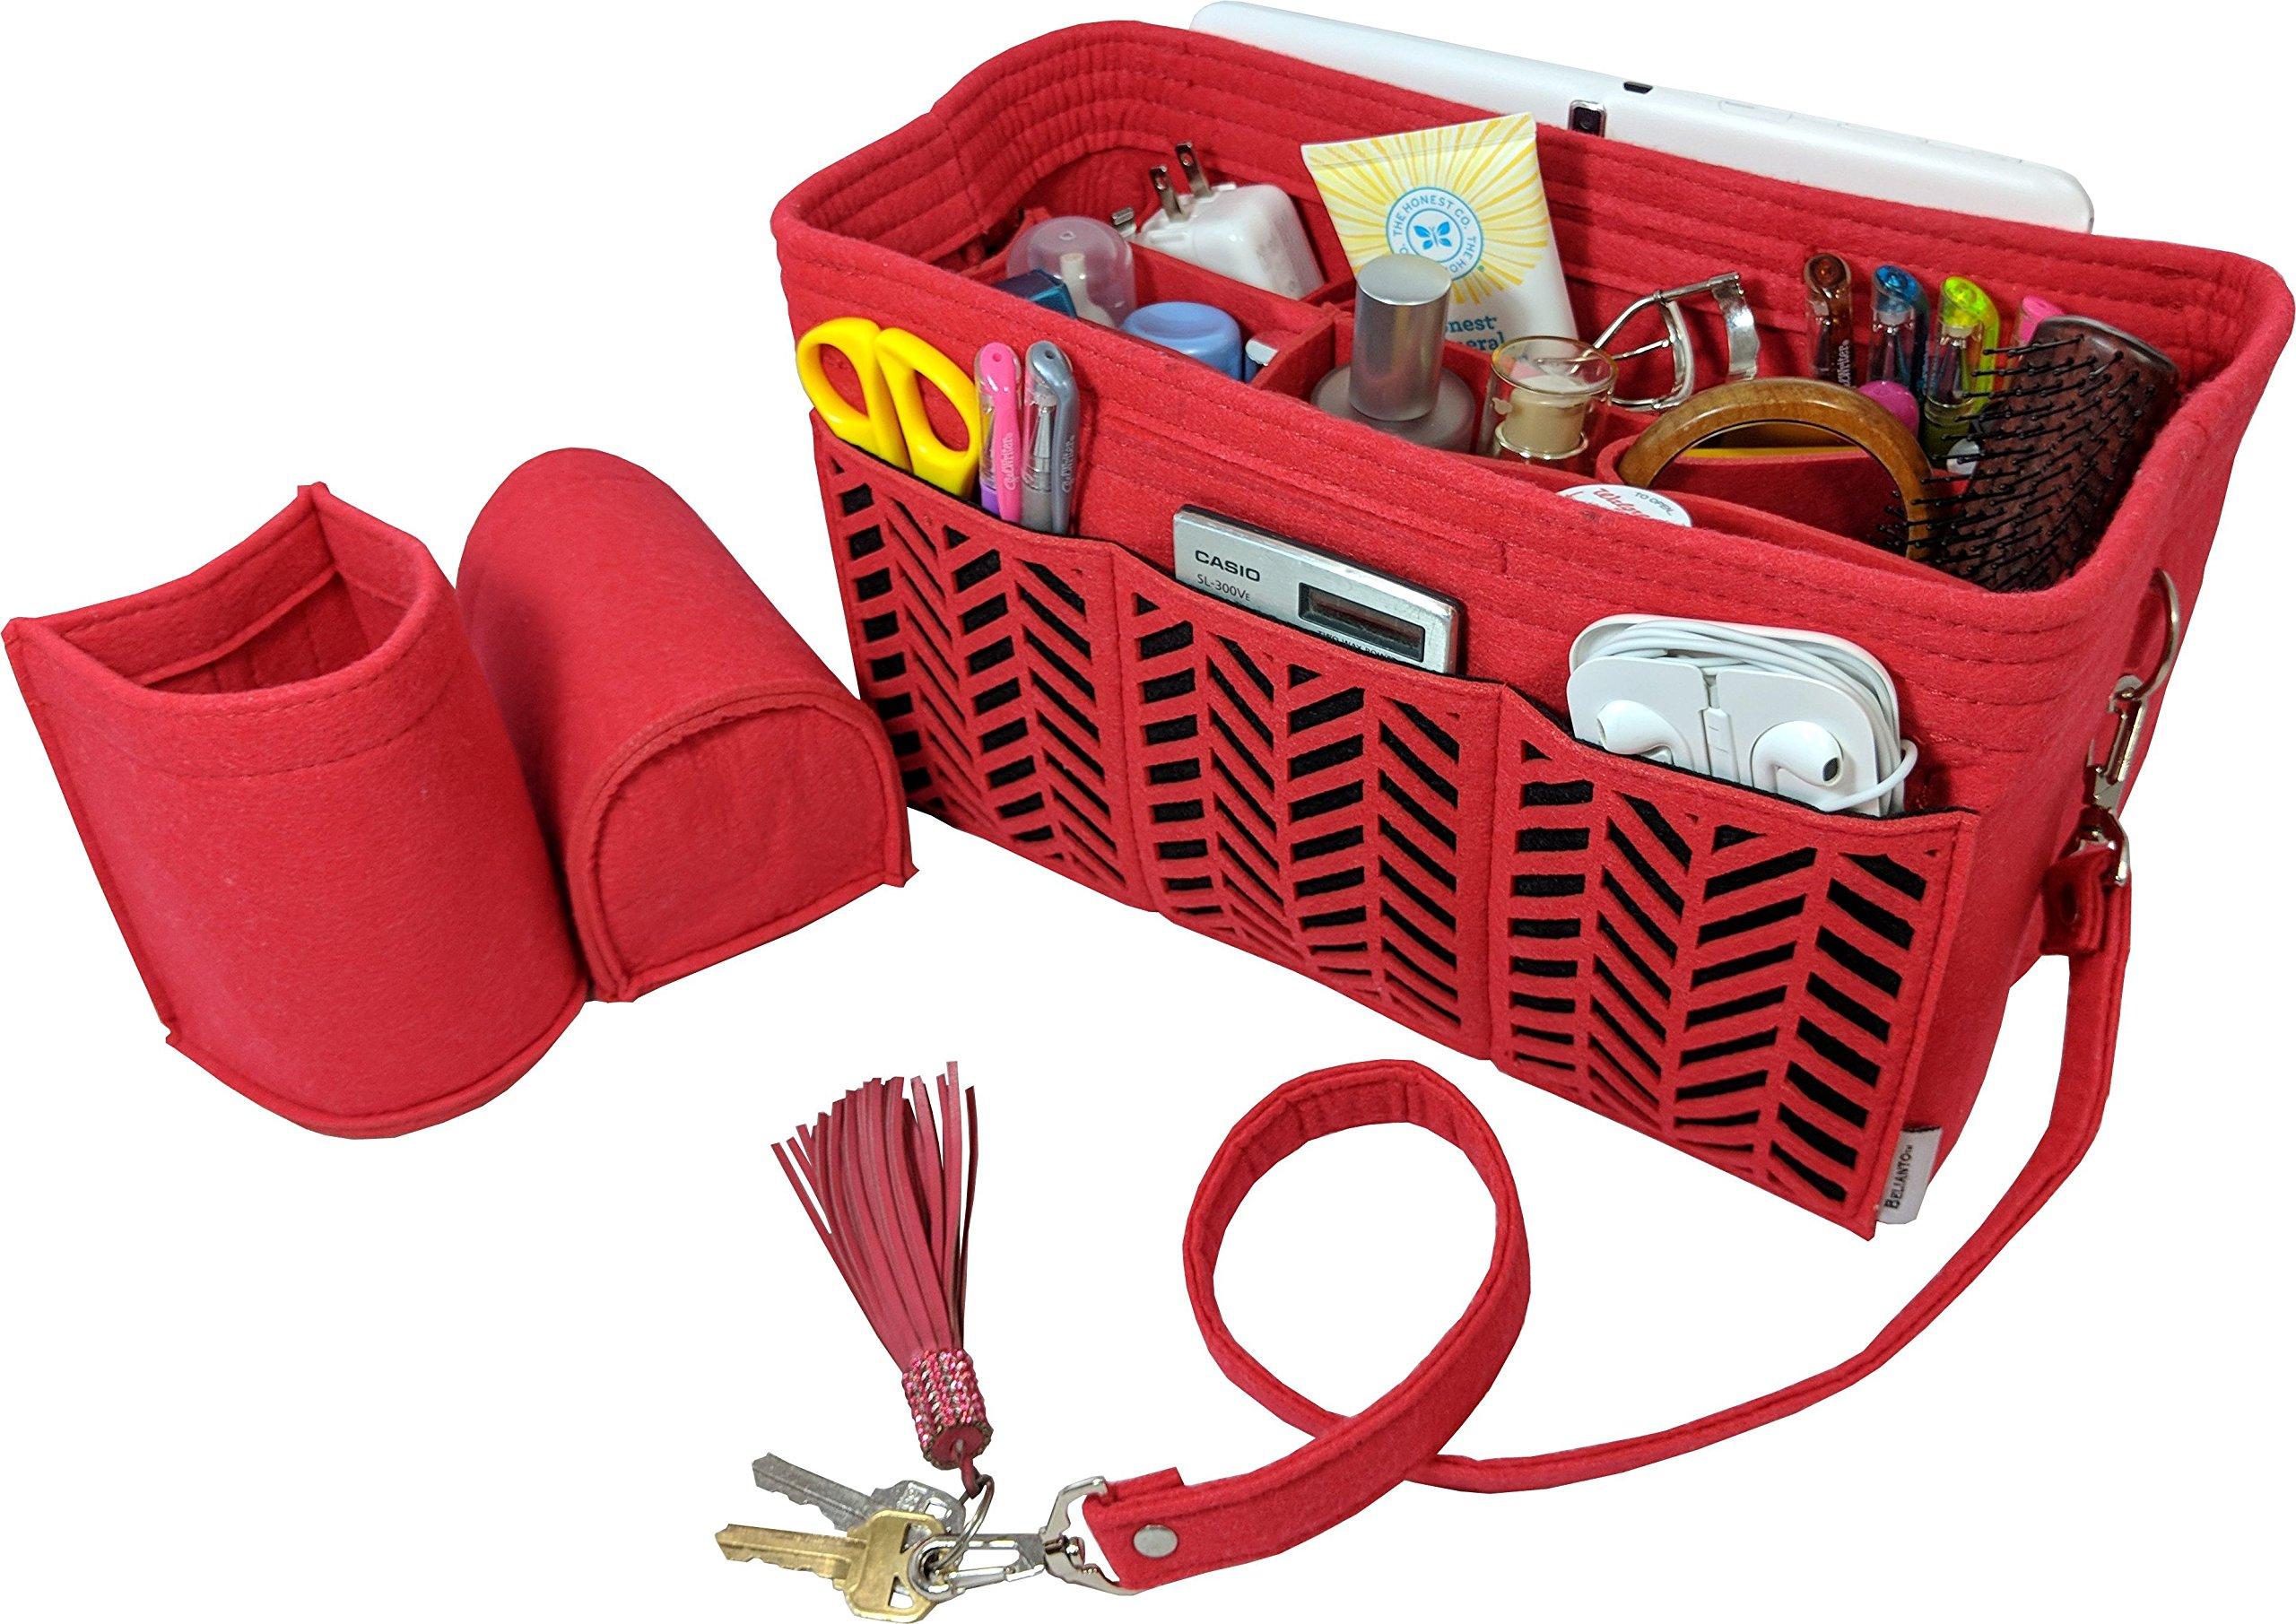 BELIANTO Felt Handbag Tote Purse Organizer Insert with Middle Insert, Bottle Holders, Key finder, D rings (Herringbone Pattern) (Large, Red)